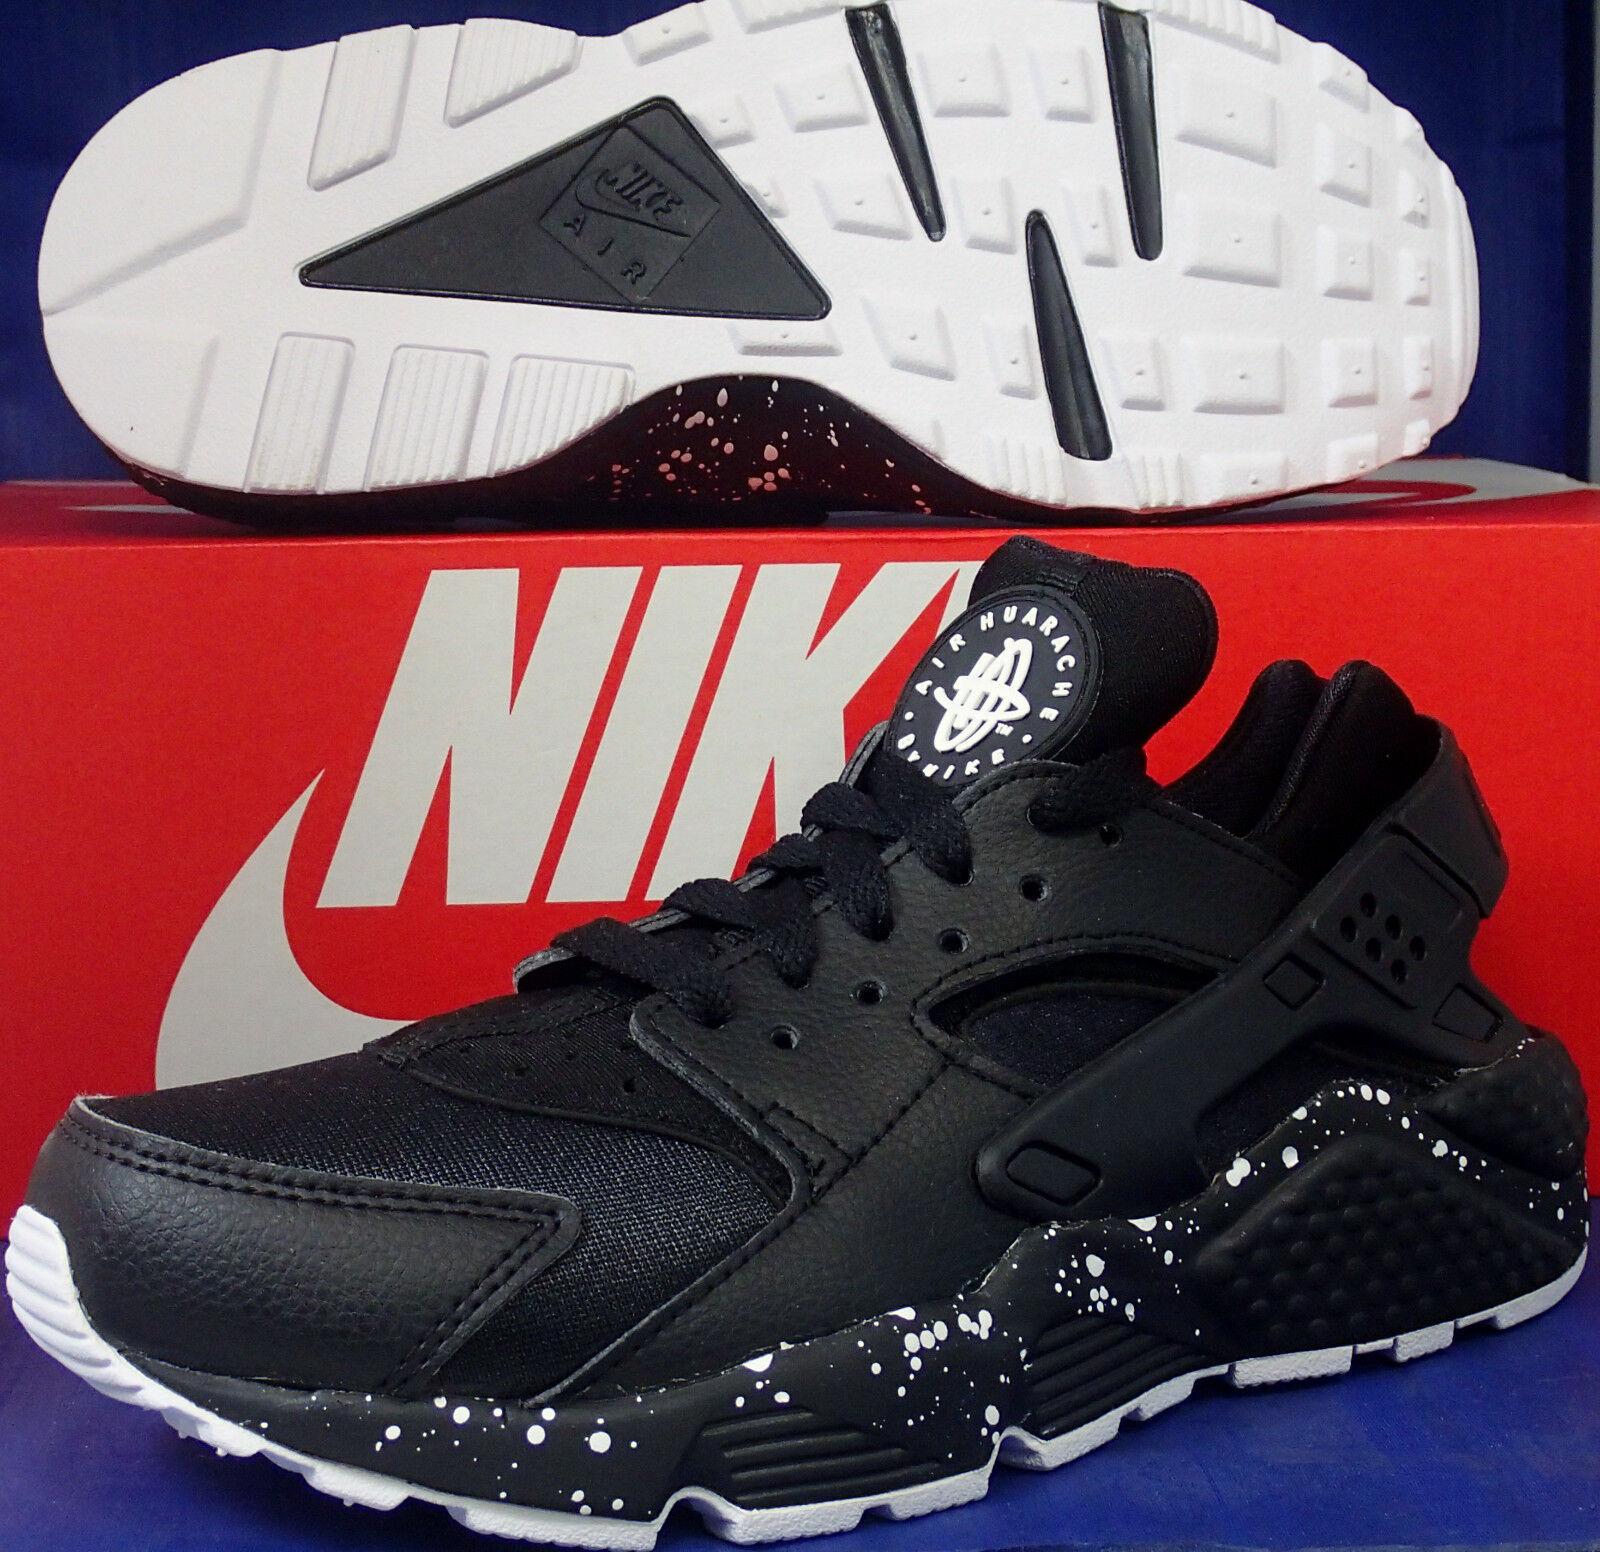 donna Nike Air Huarache Run iD nero bianca SZ 6.5 ( 777331-994 )